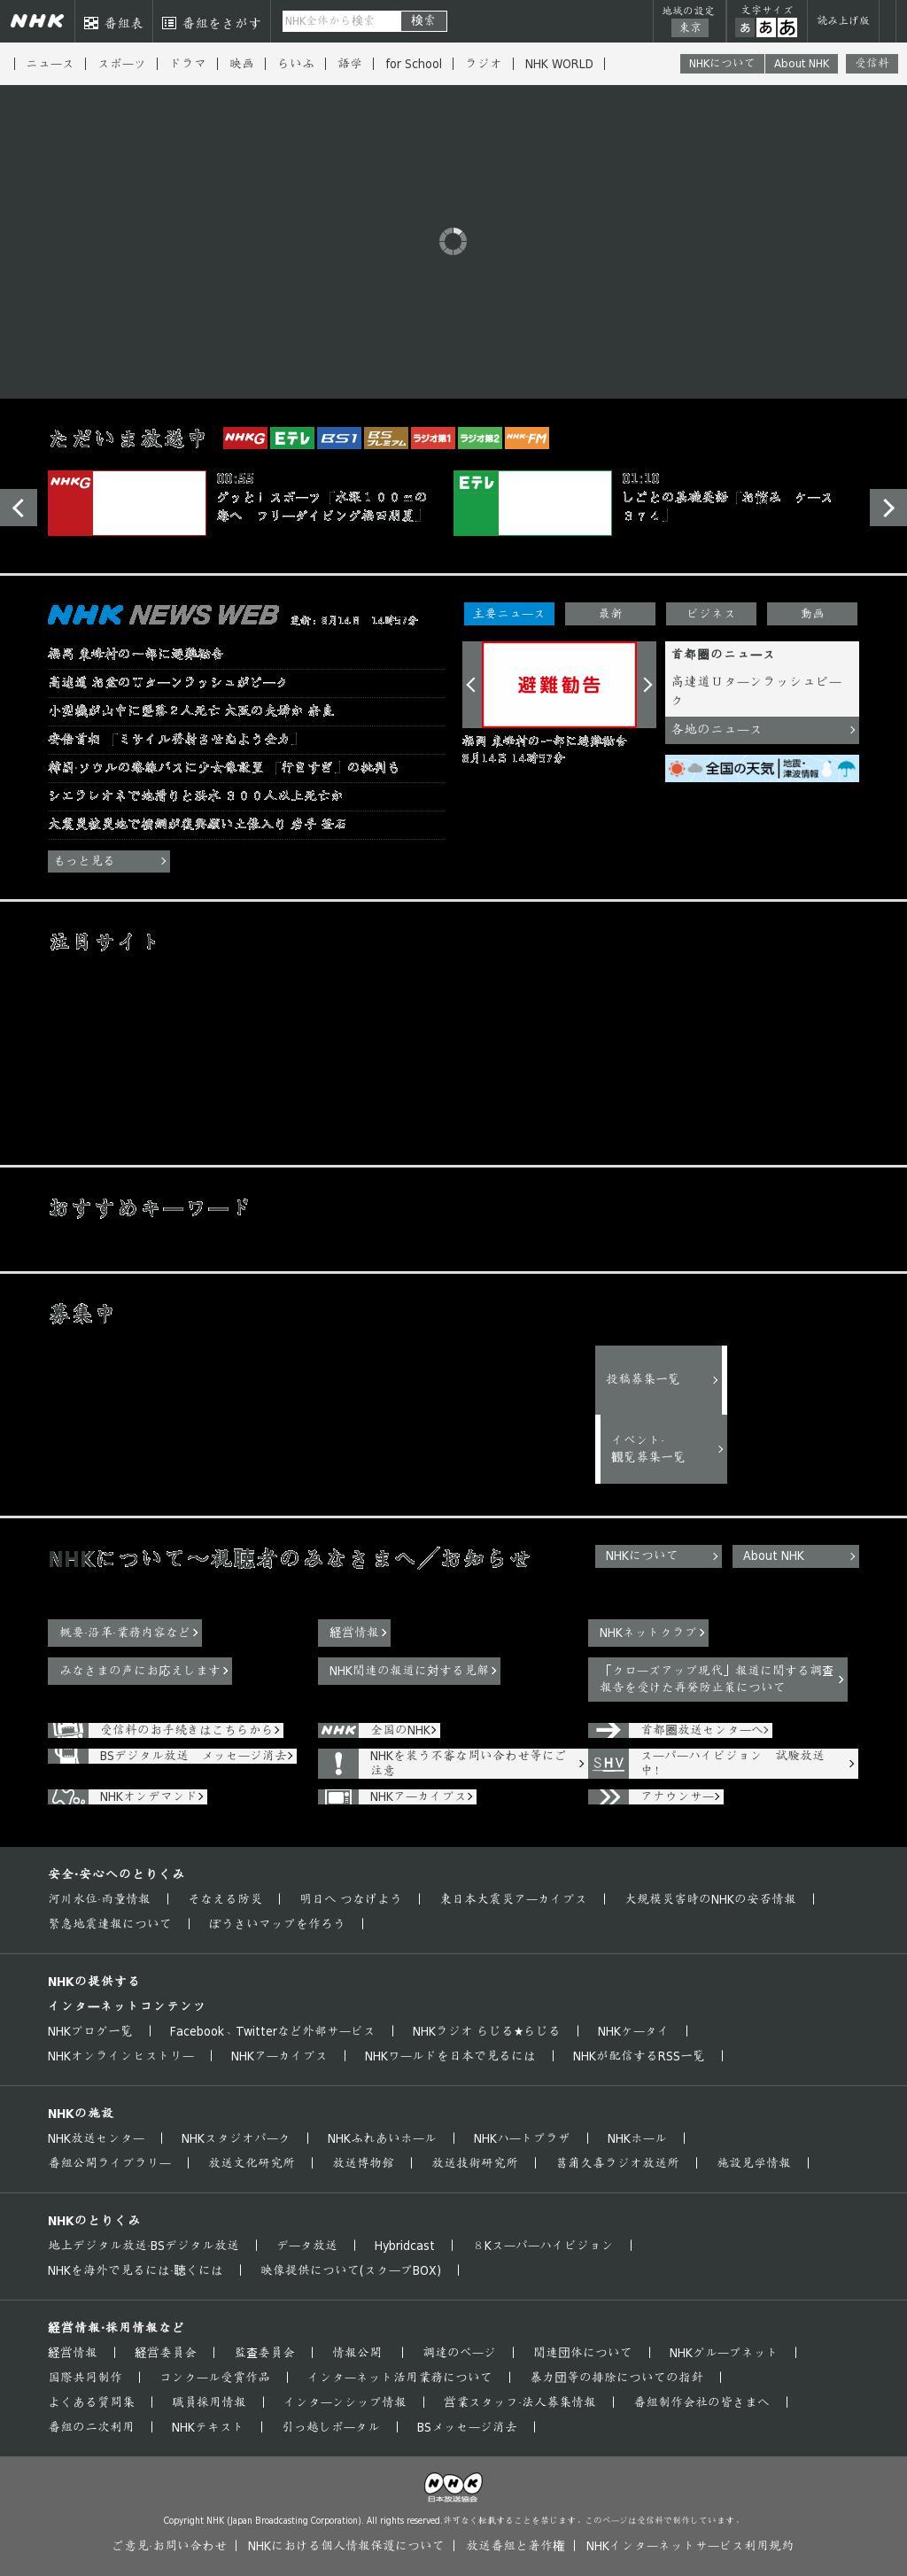 NHK Online at Monday Aug. 14, 2017, 4:17 p.m. UTC